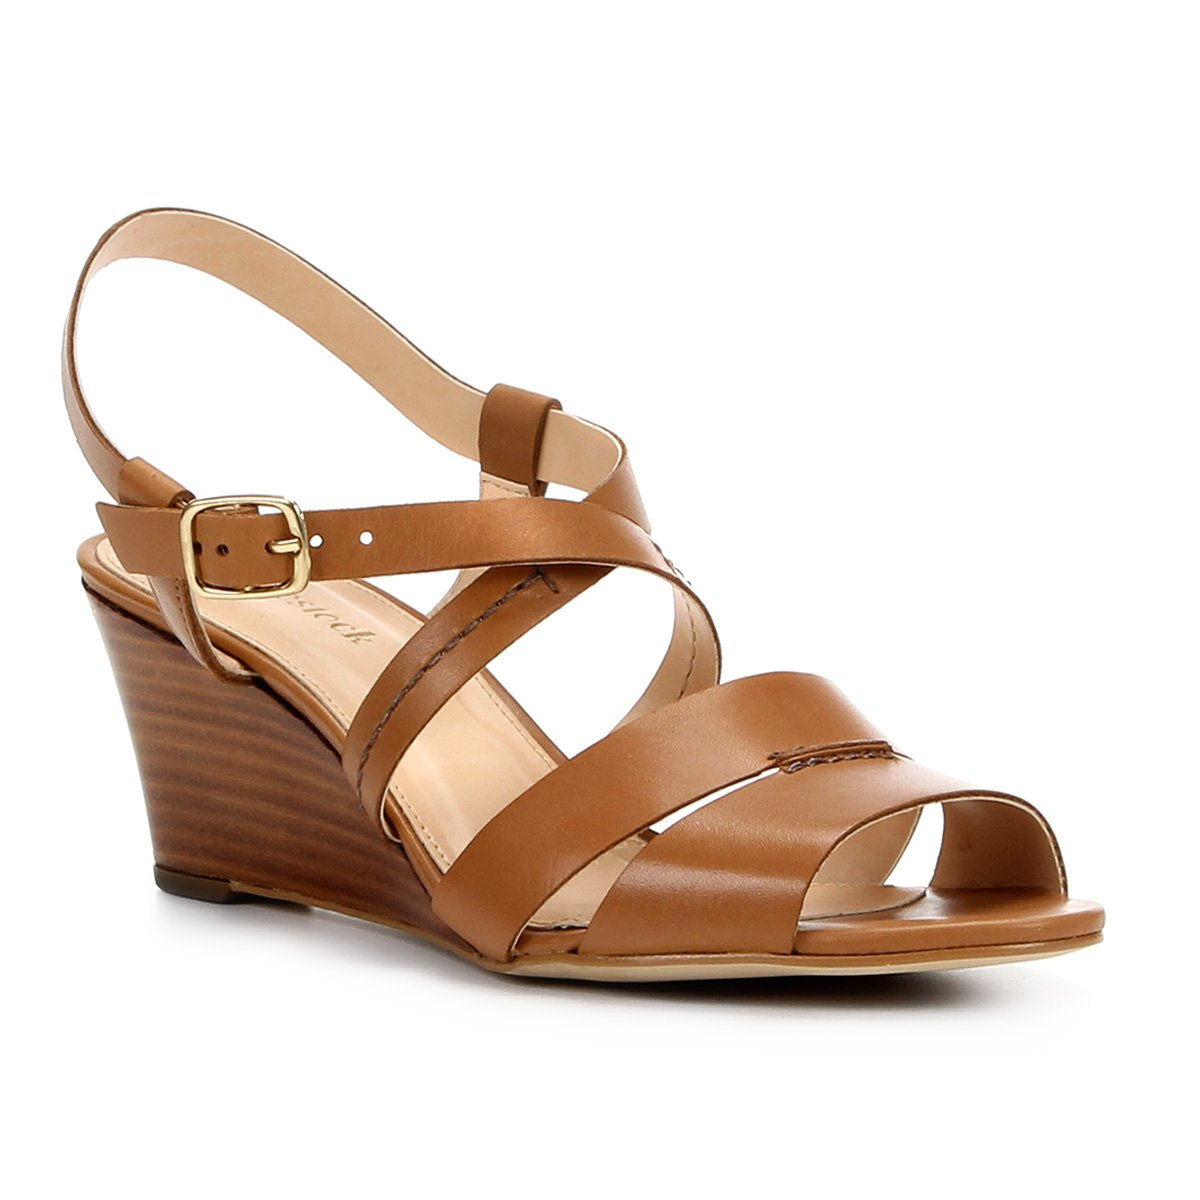 27b4e7181d Sandália Anabela Couro Shoestock Baixa Feminina | Shoestock